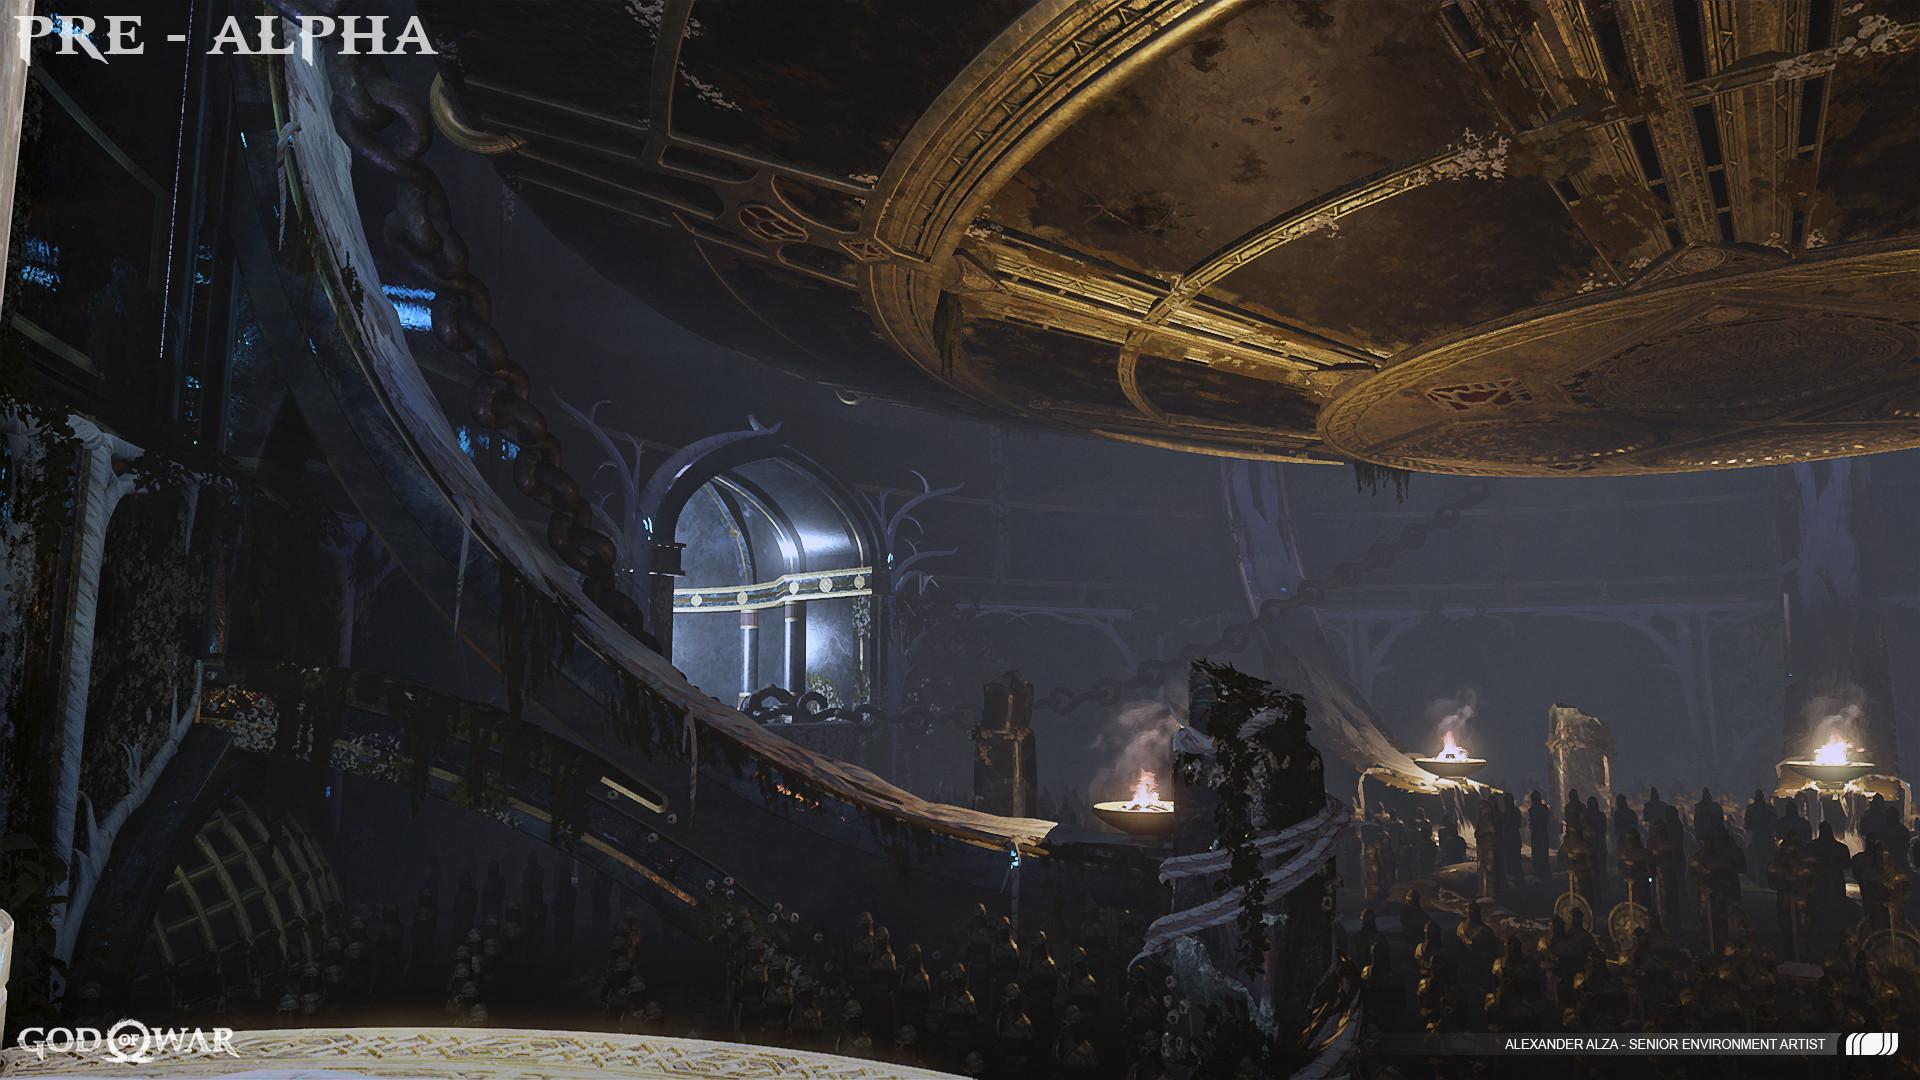 Alexander alza templefacade 03